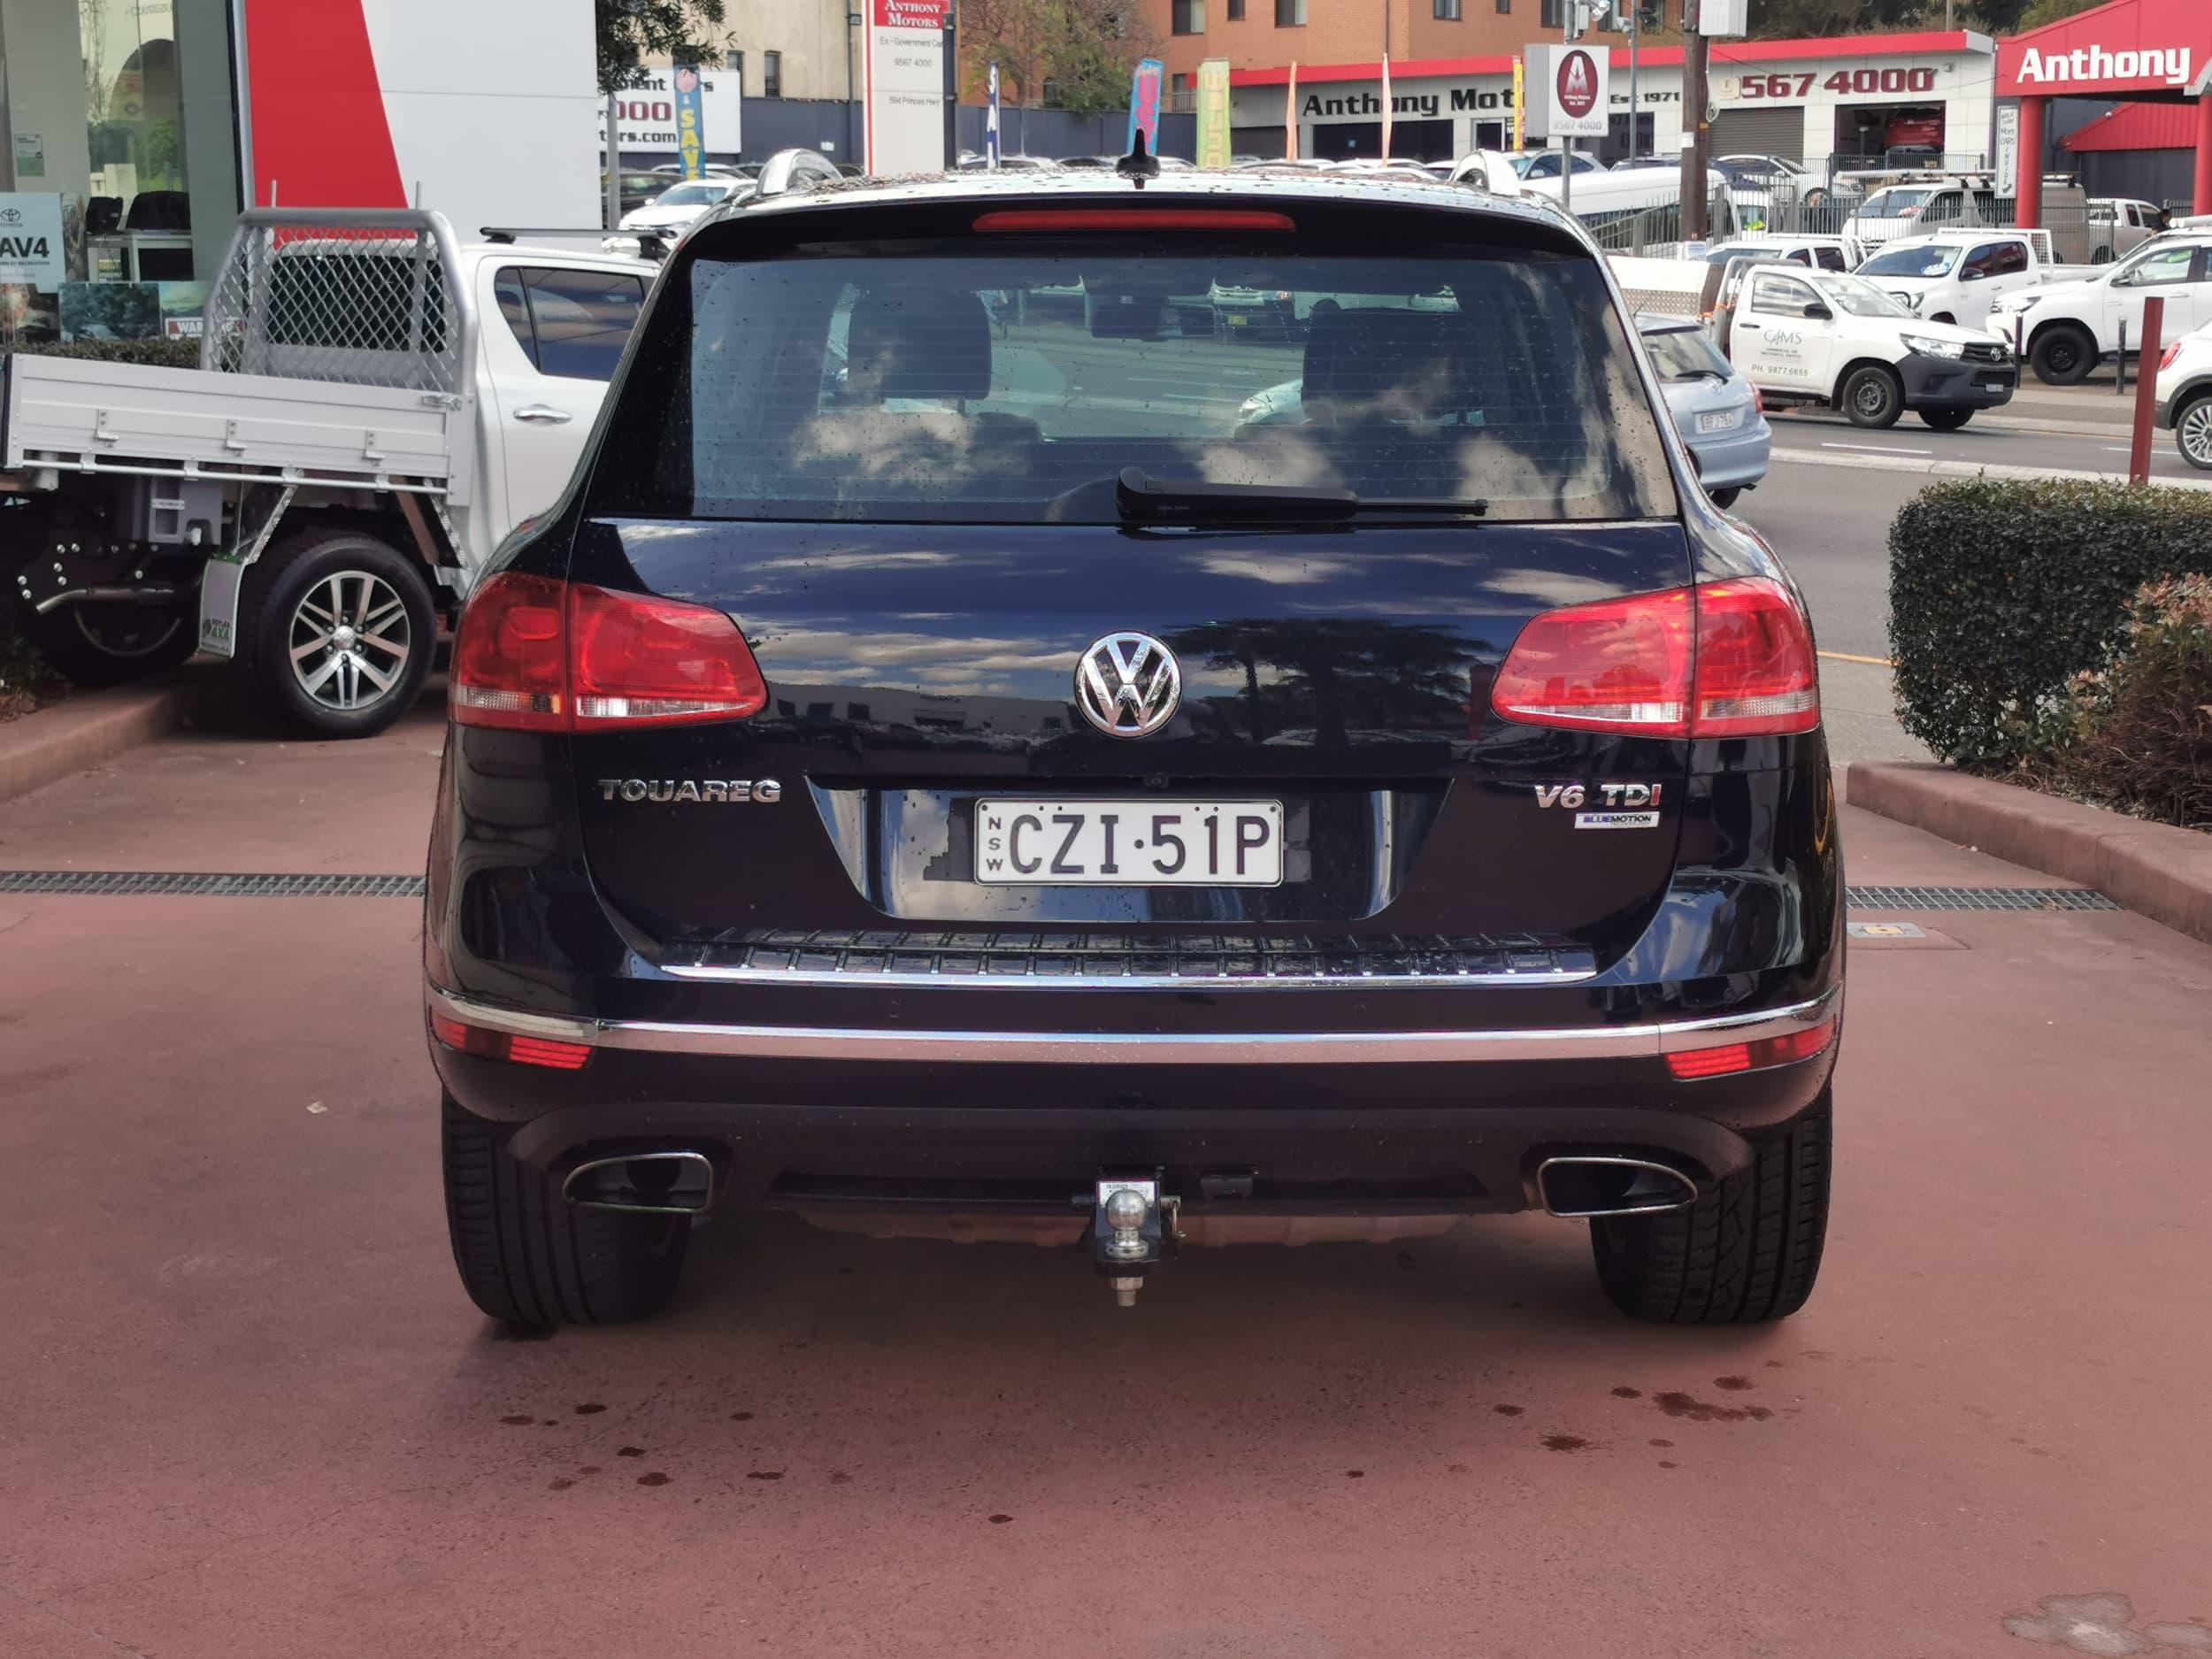 2015 Volkswagen Touareg V6 TDI 7P Auto 4MOTION MY16 - image 5